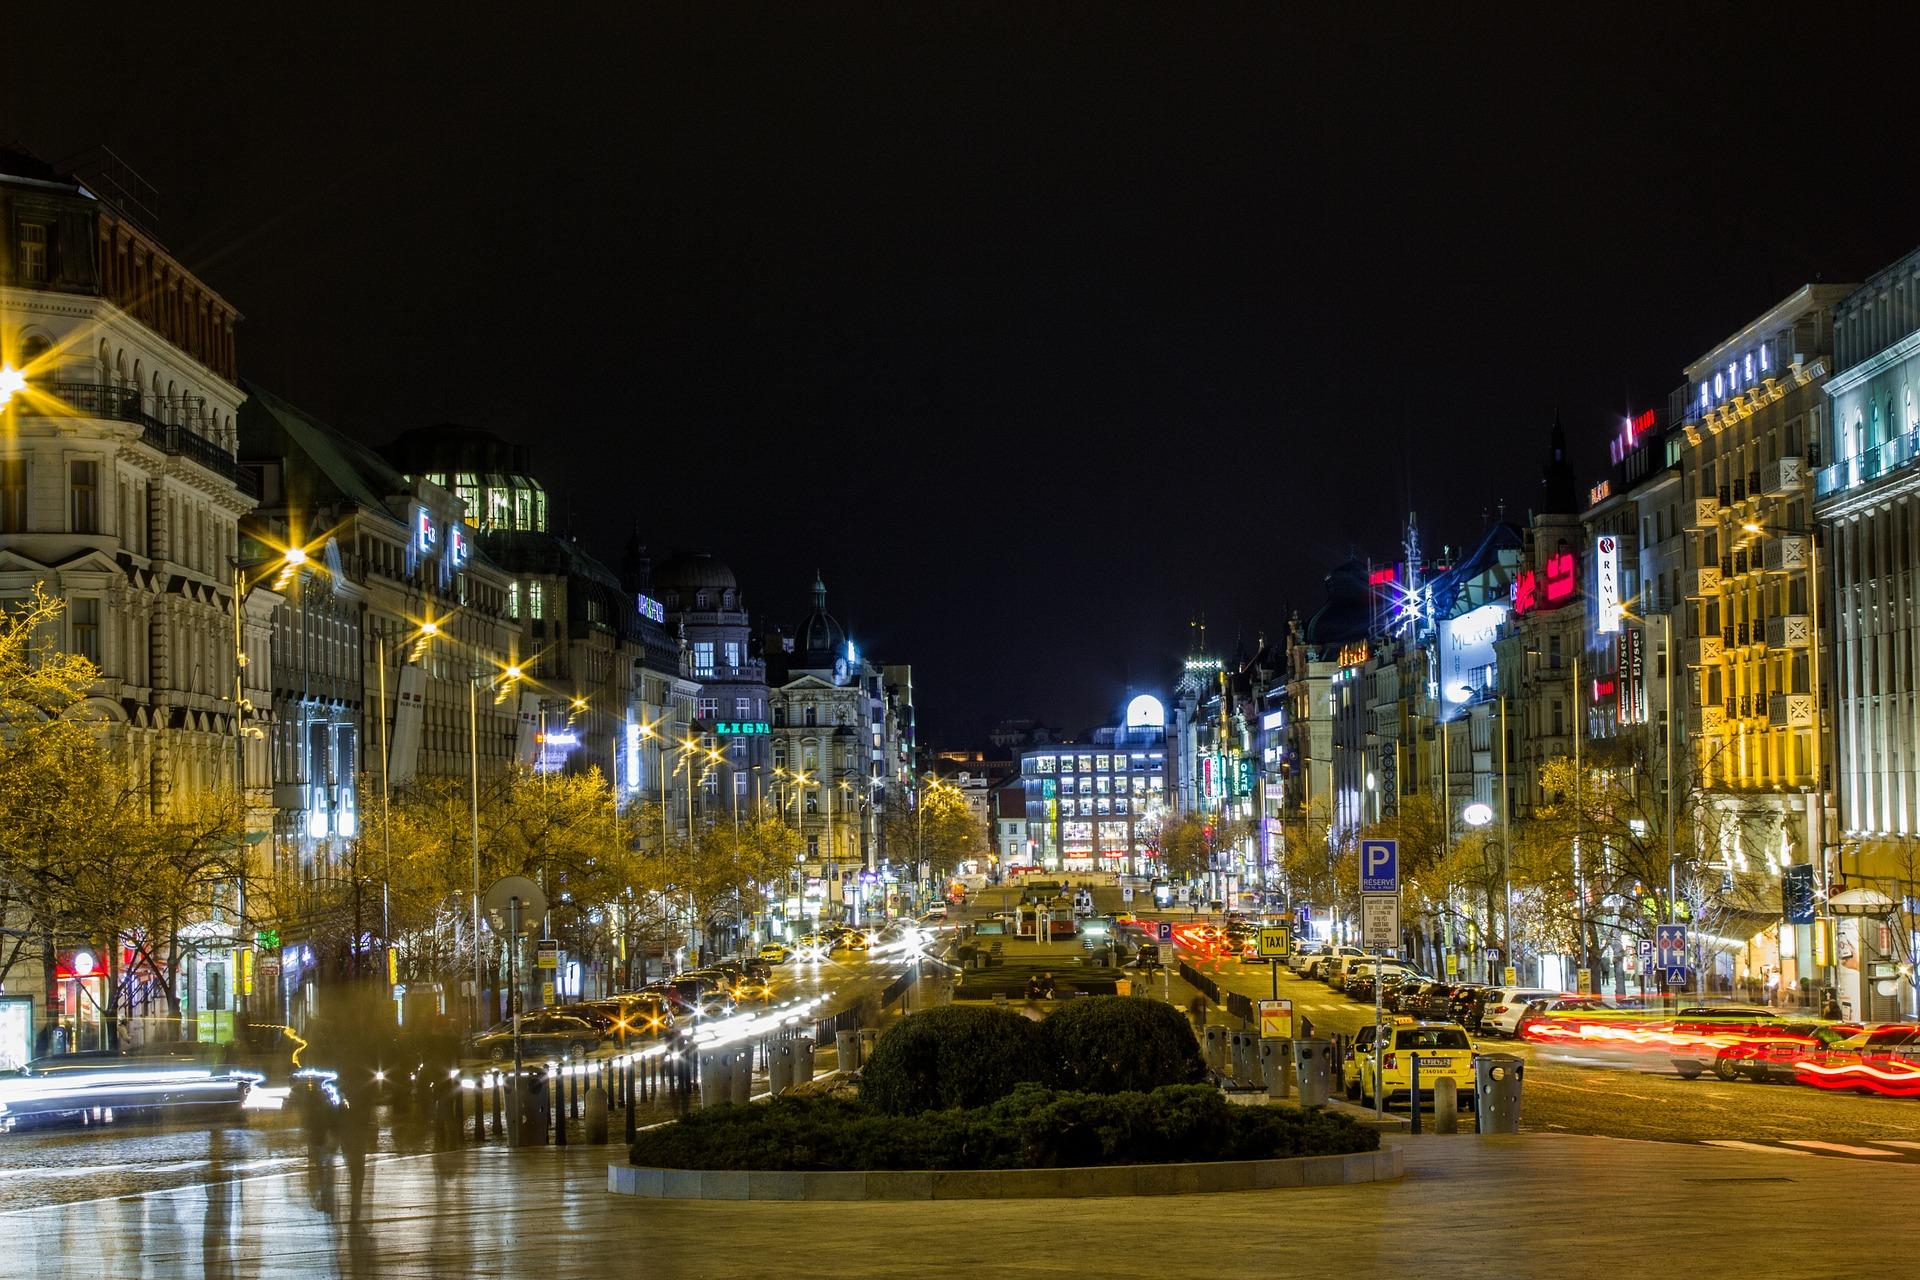 Piața Weceslas excursie Praga Revelion 2020